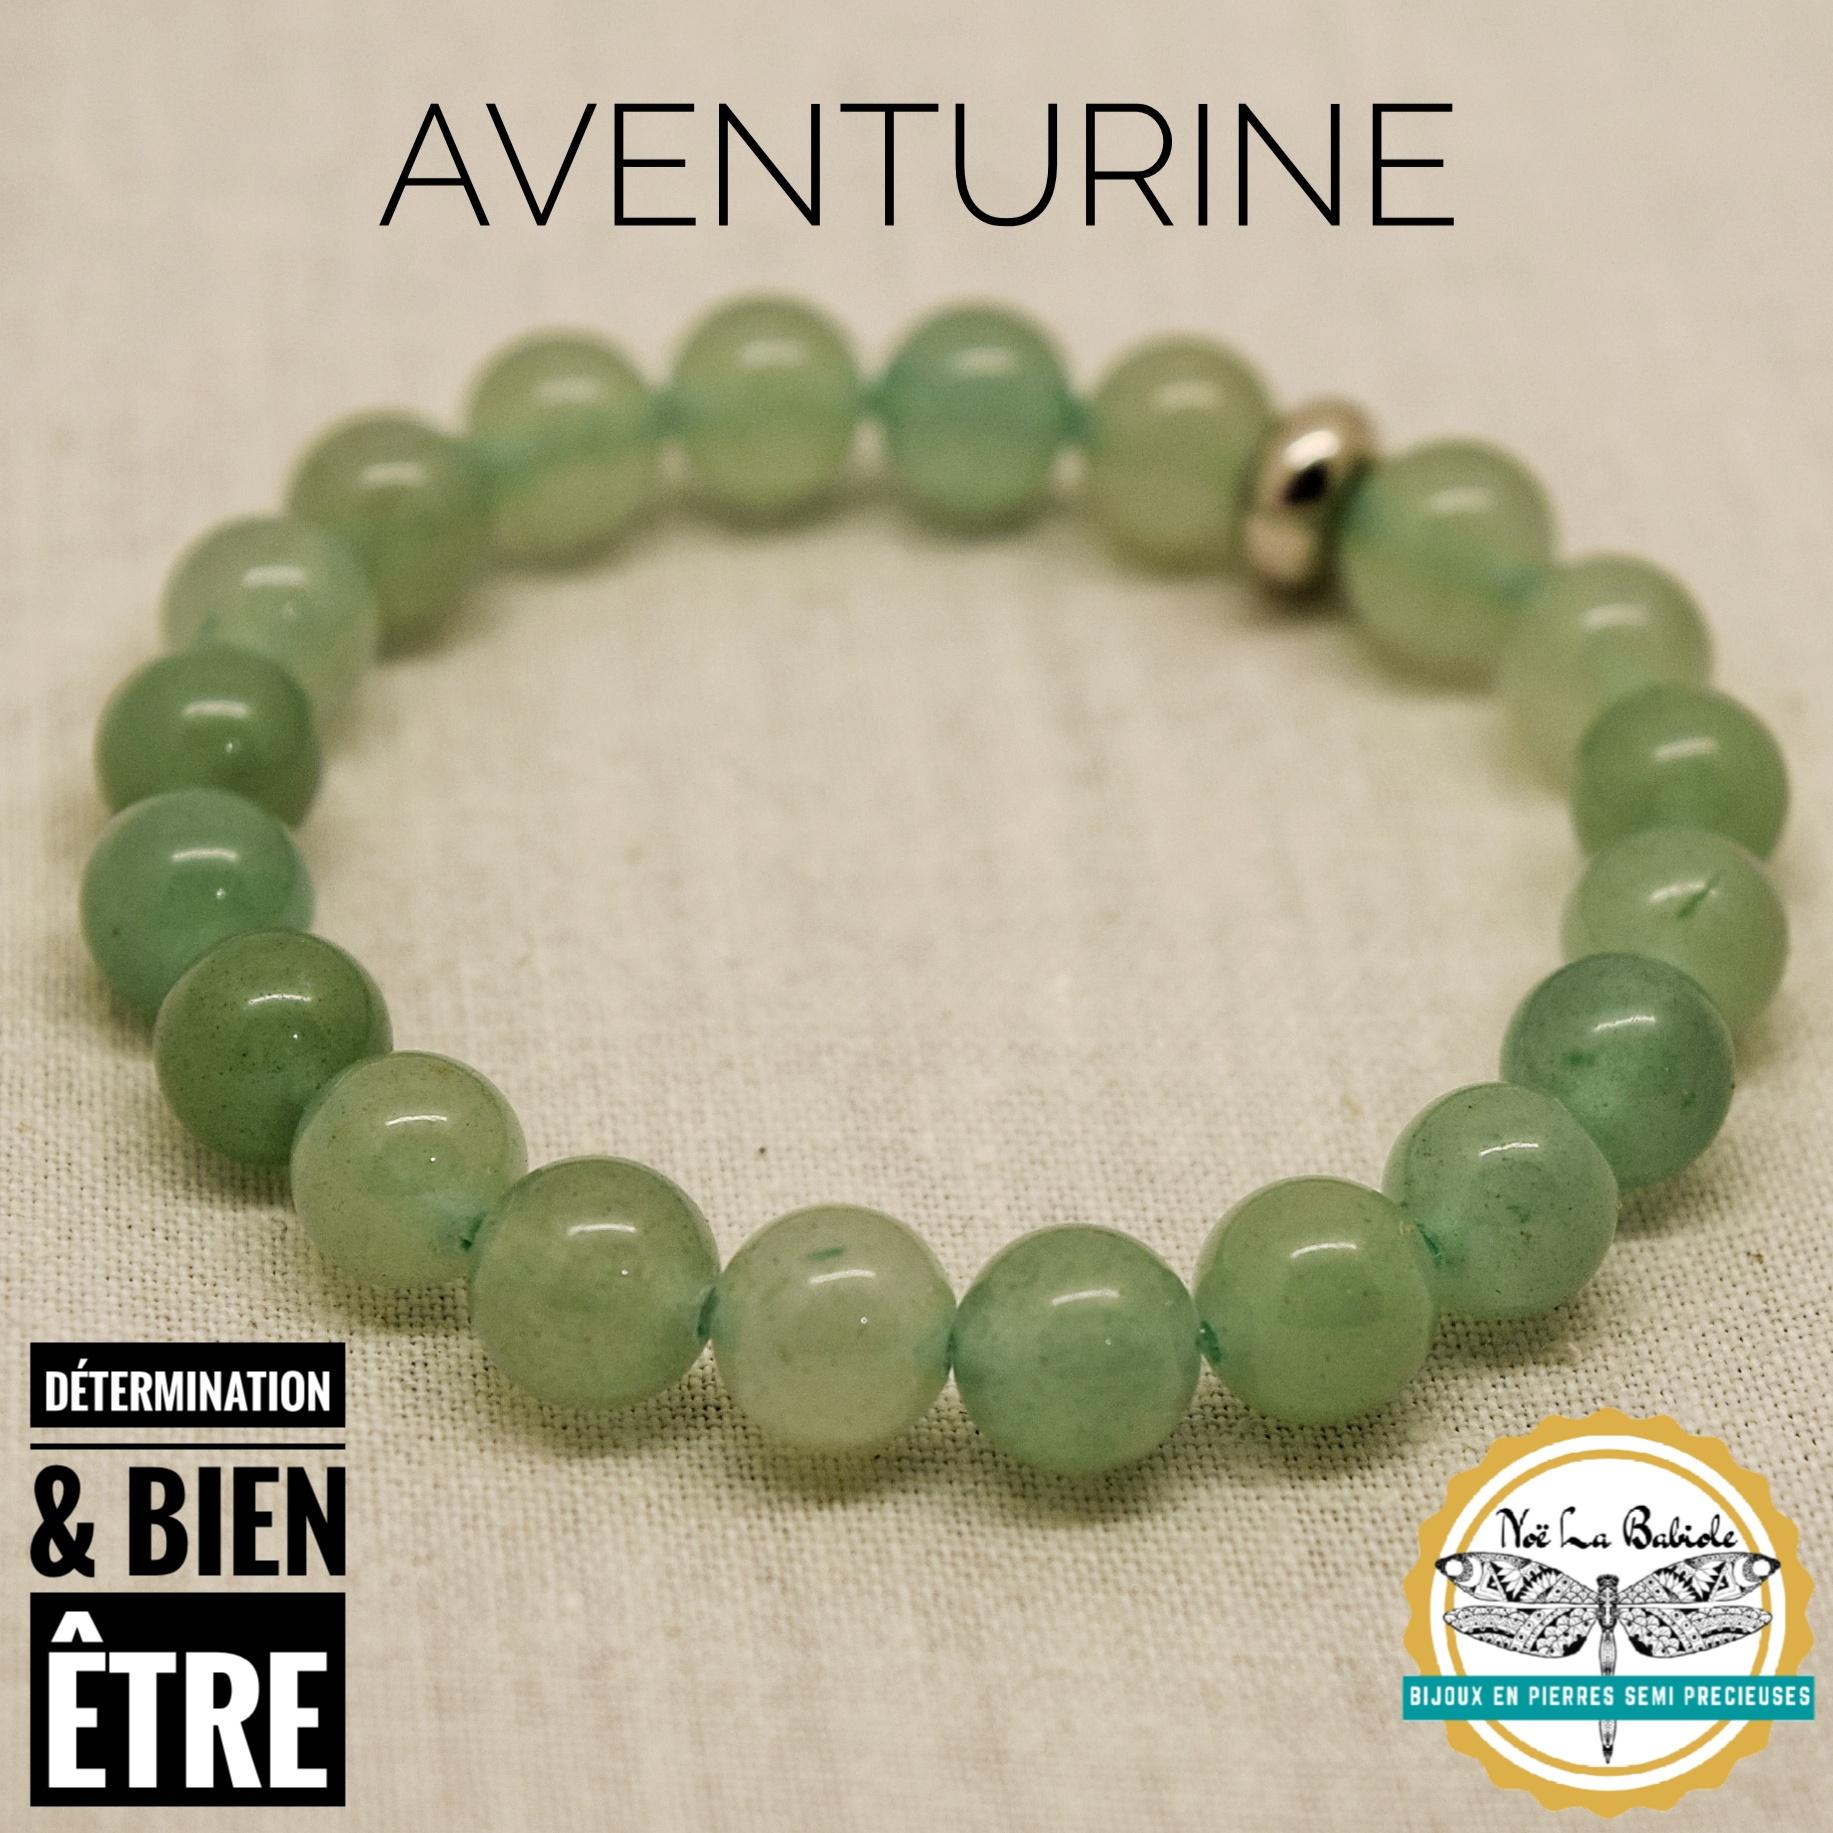 Bracelet Bien être & Determination en Aventurine verte